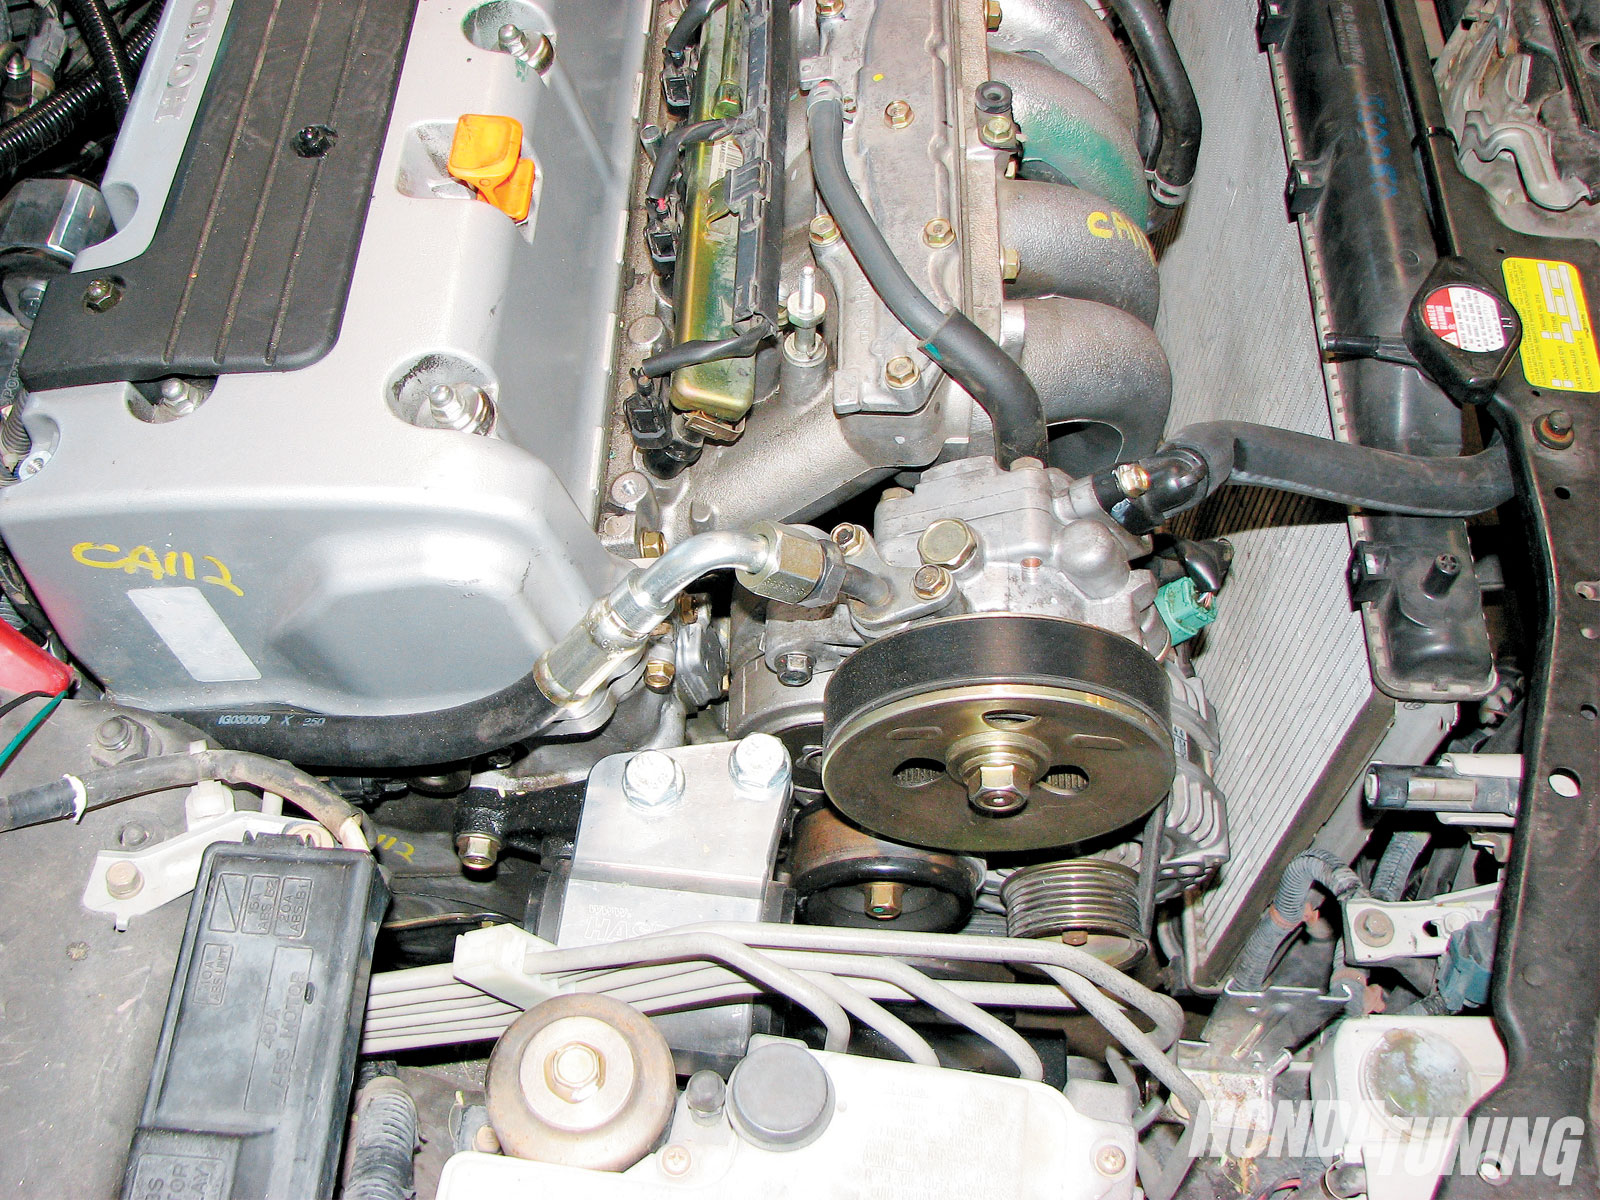 honda accord k24 engine swap honda tuning magazinhtup 1007 07 o honda accord k24 engine swap [ 1600 x 1200 Pixel ]